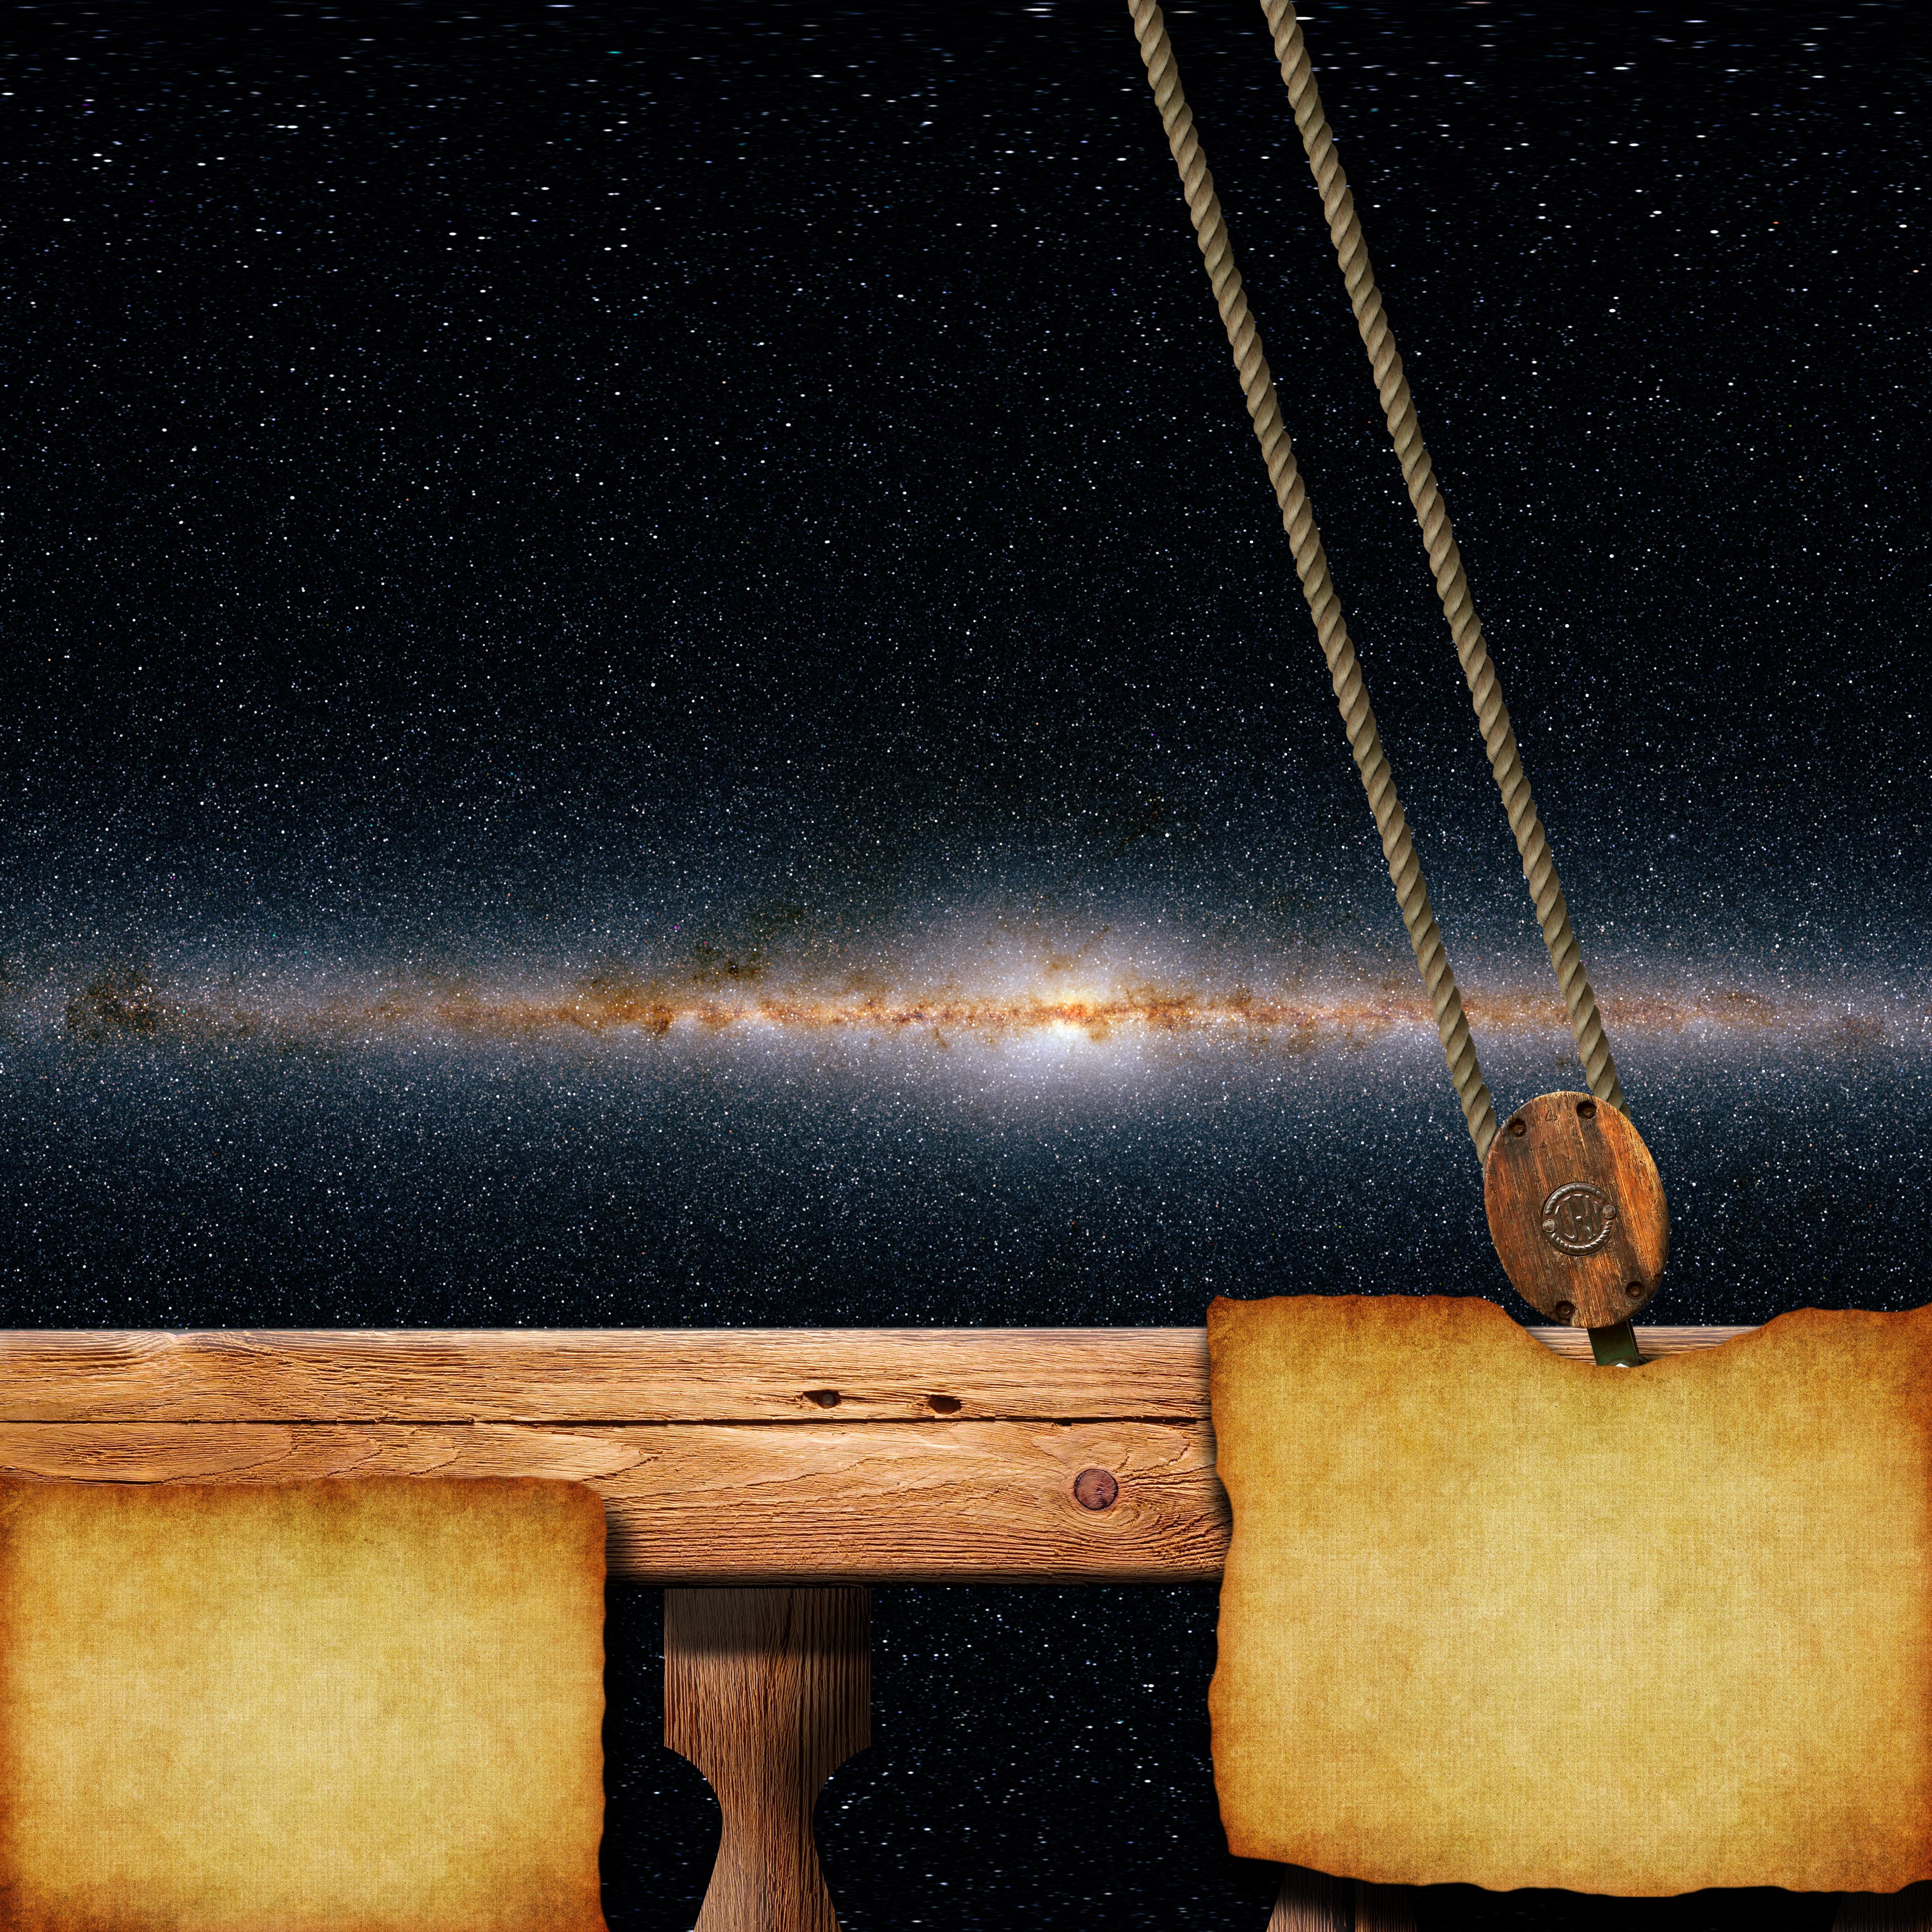 Sailing the Stars by Anarisis